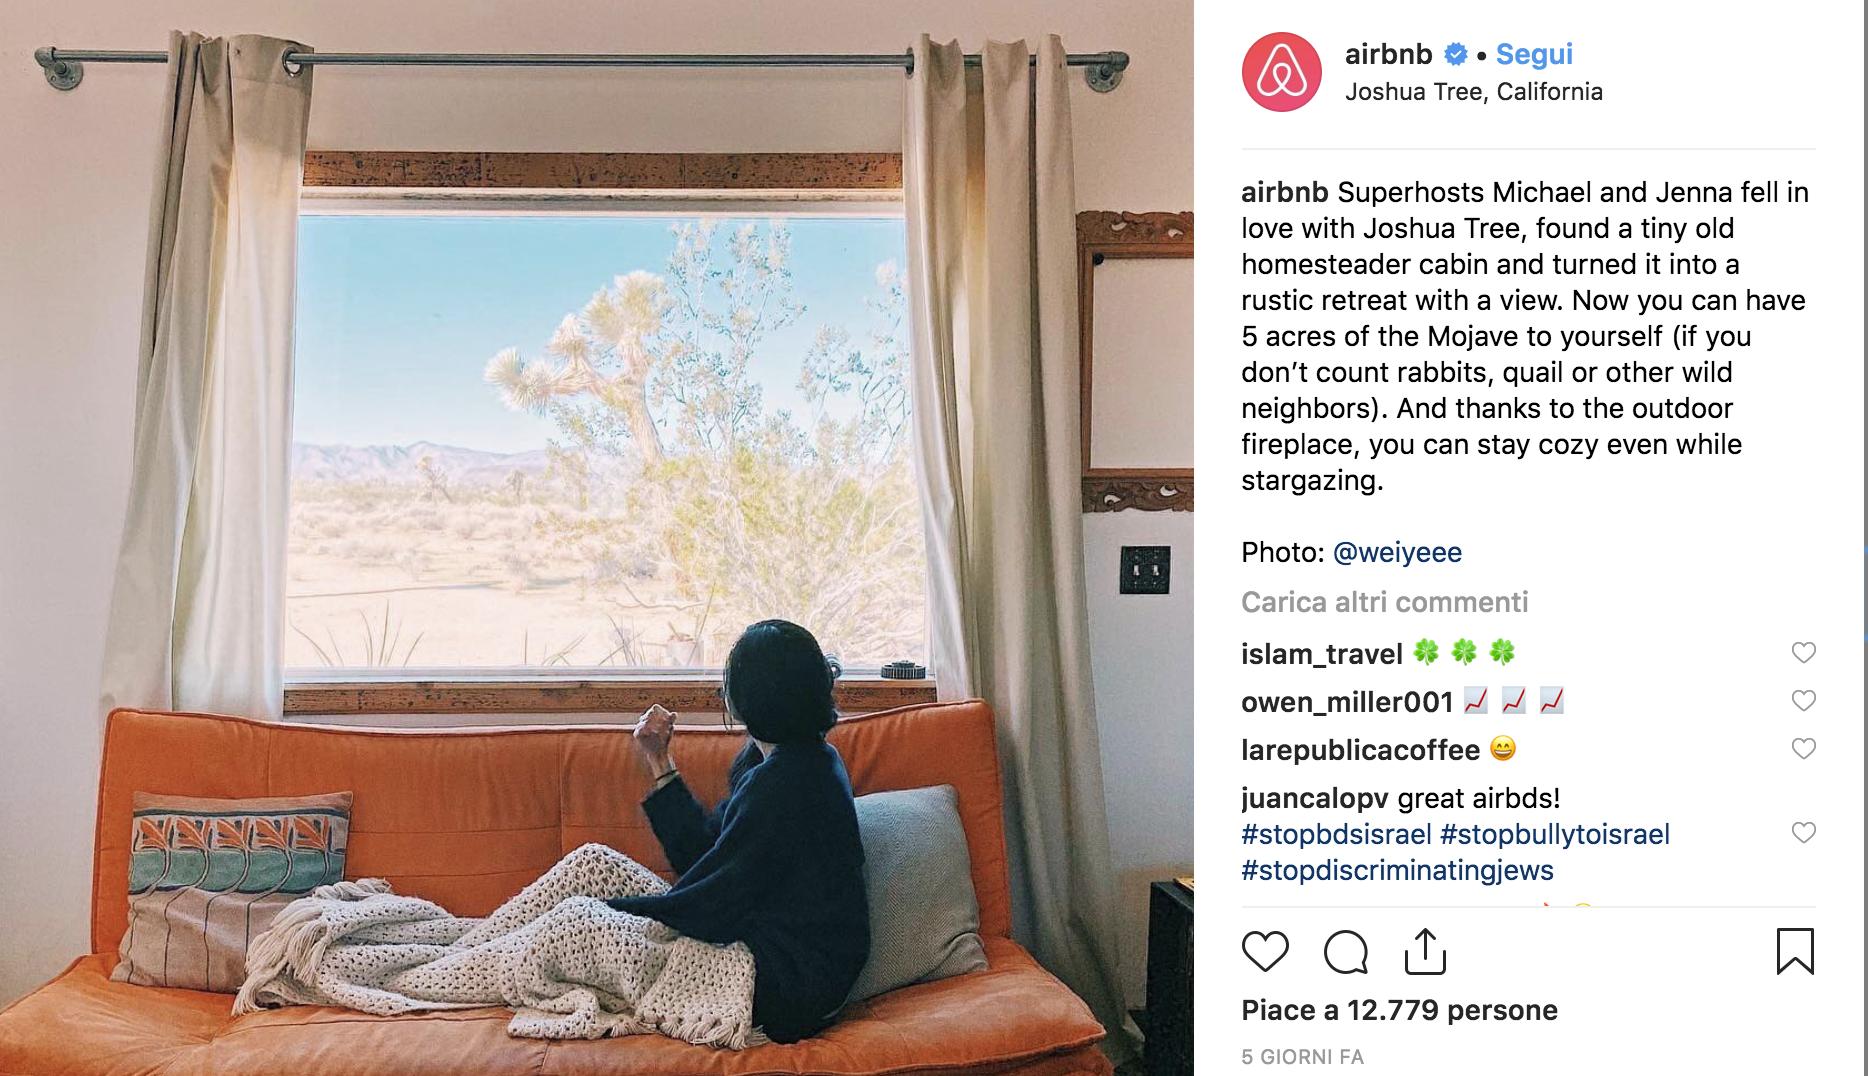 cos'è airbnb, come funziona airbnb, airbnb affidabile